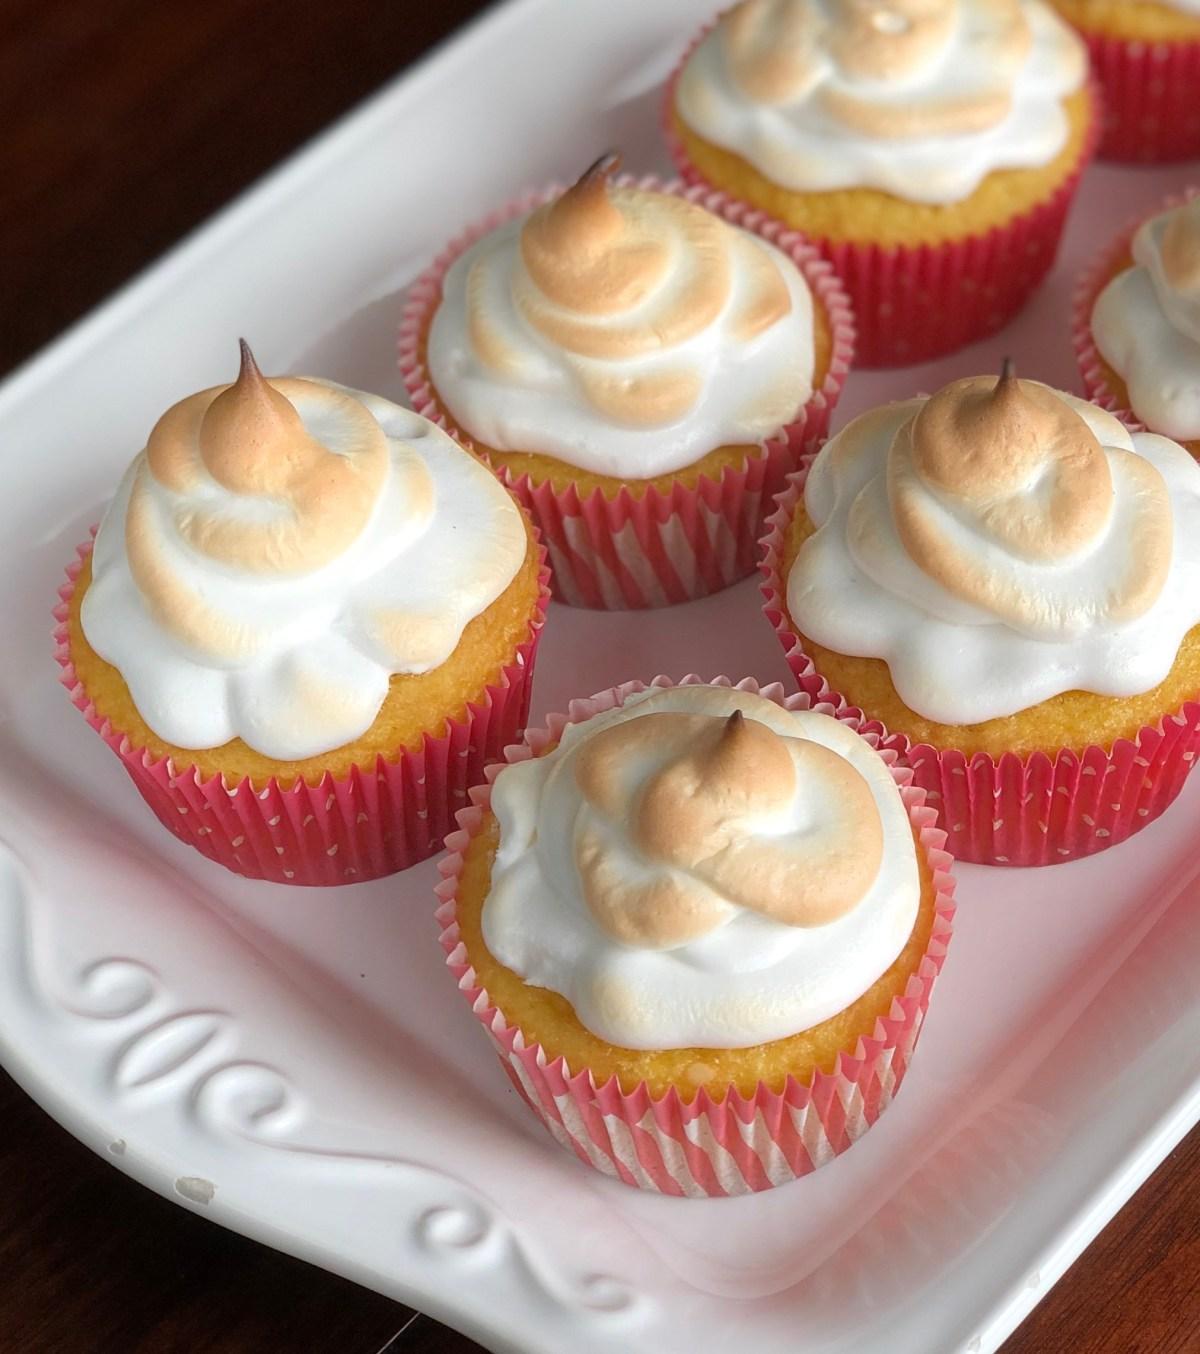 Lemon Meringue Cupcakes by Happylifeblogspot.com #lemonmeringuecupcakes #cupcakes #lemonmeringue #springdesserts #desserts #bakesalerecipes #lemoncupcakes